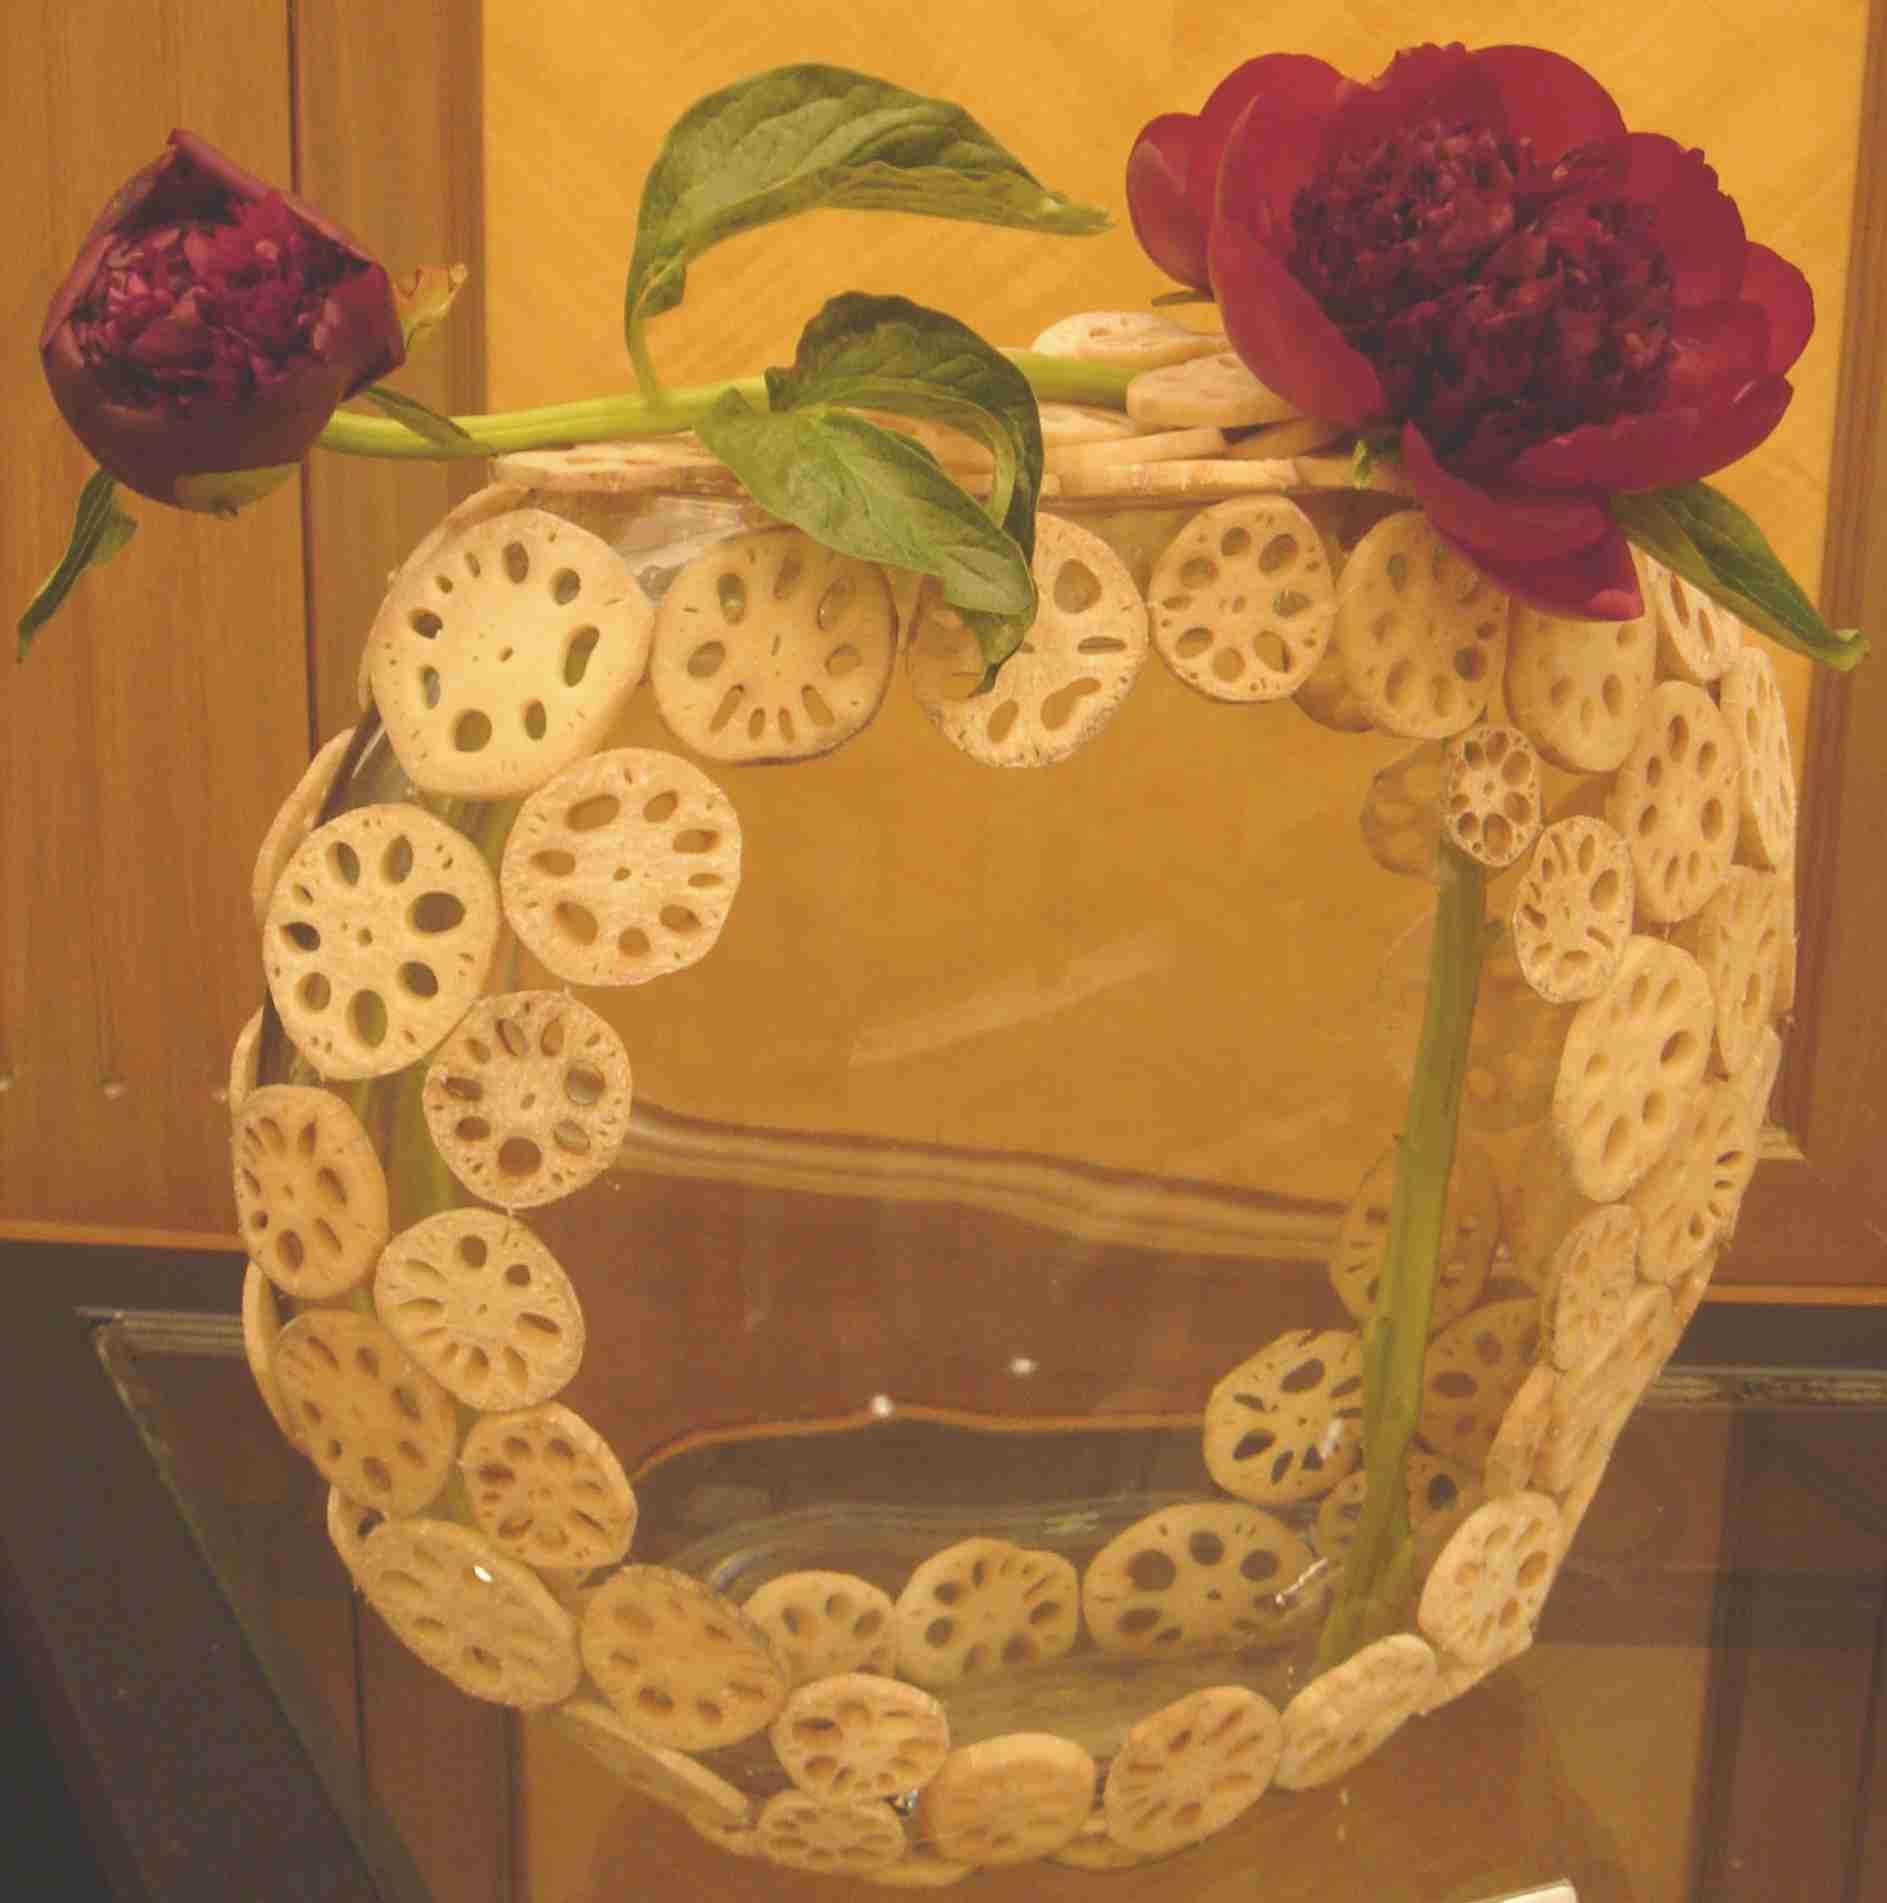 Floral design ideas | Floral Designing ideas | Pinterest | Floral ...